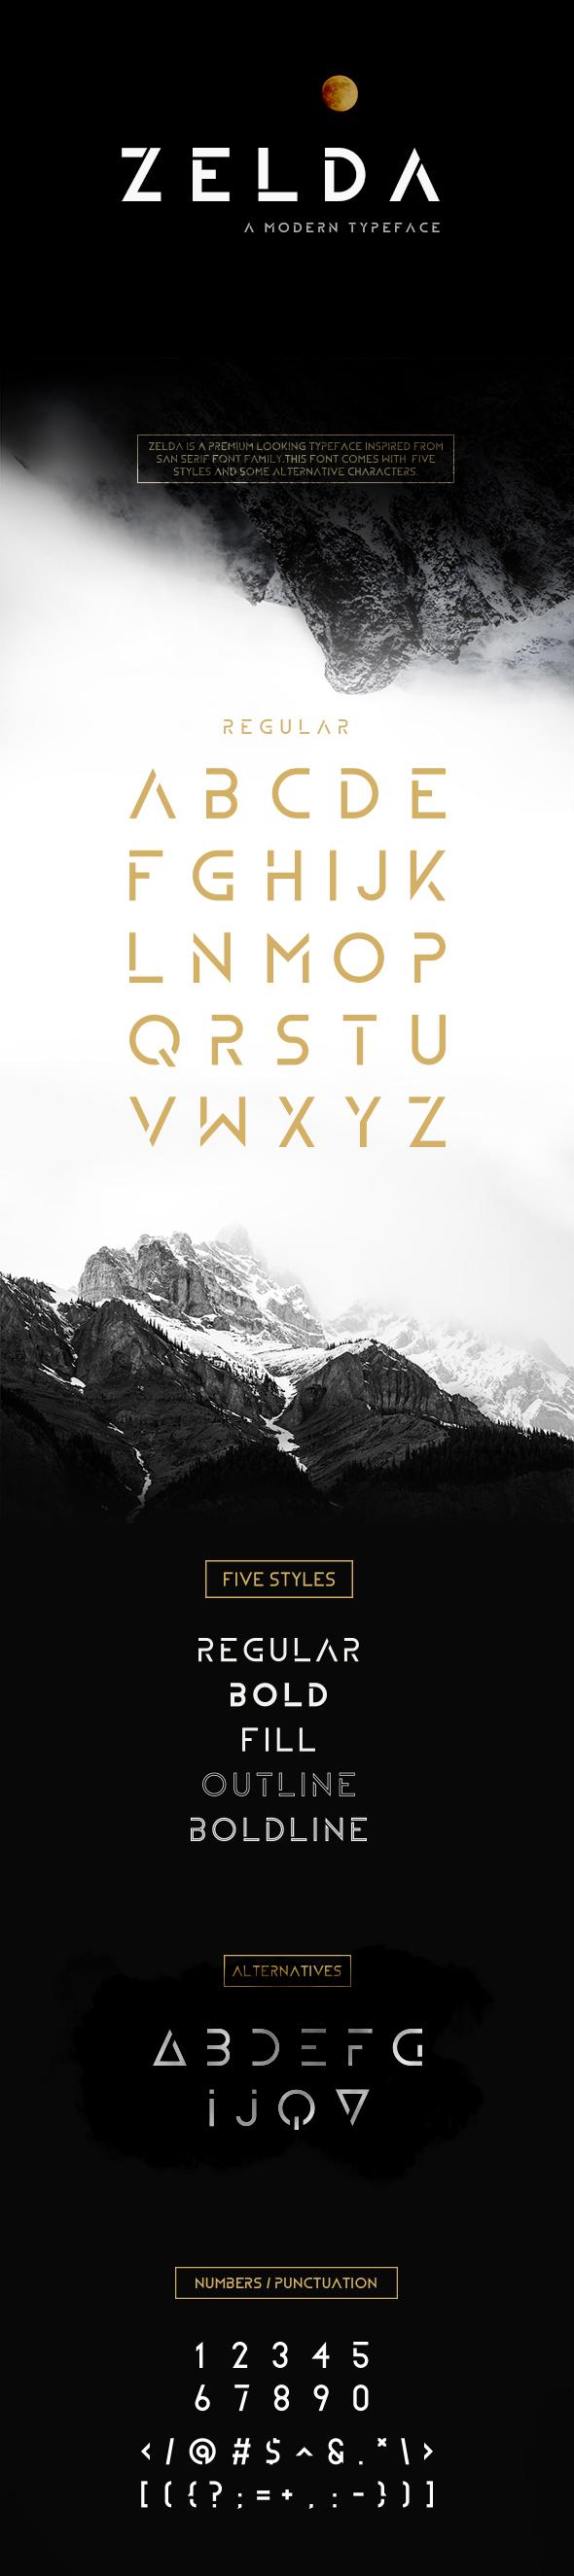 ZELDA Typefamily - Sans-Serif Fonts